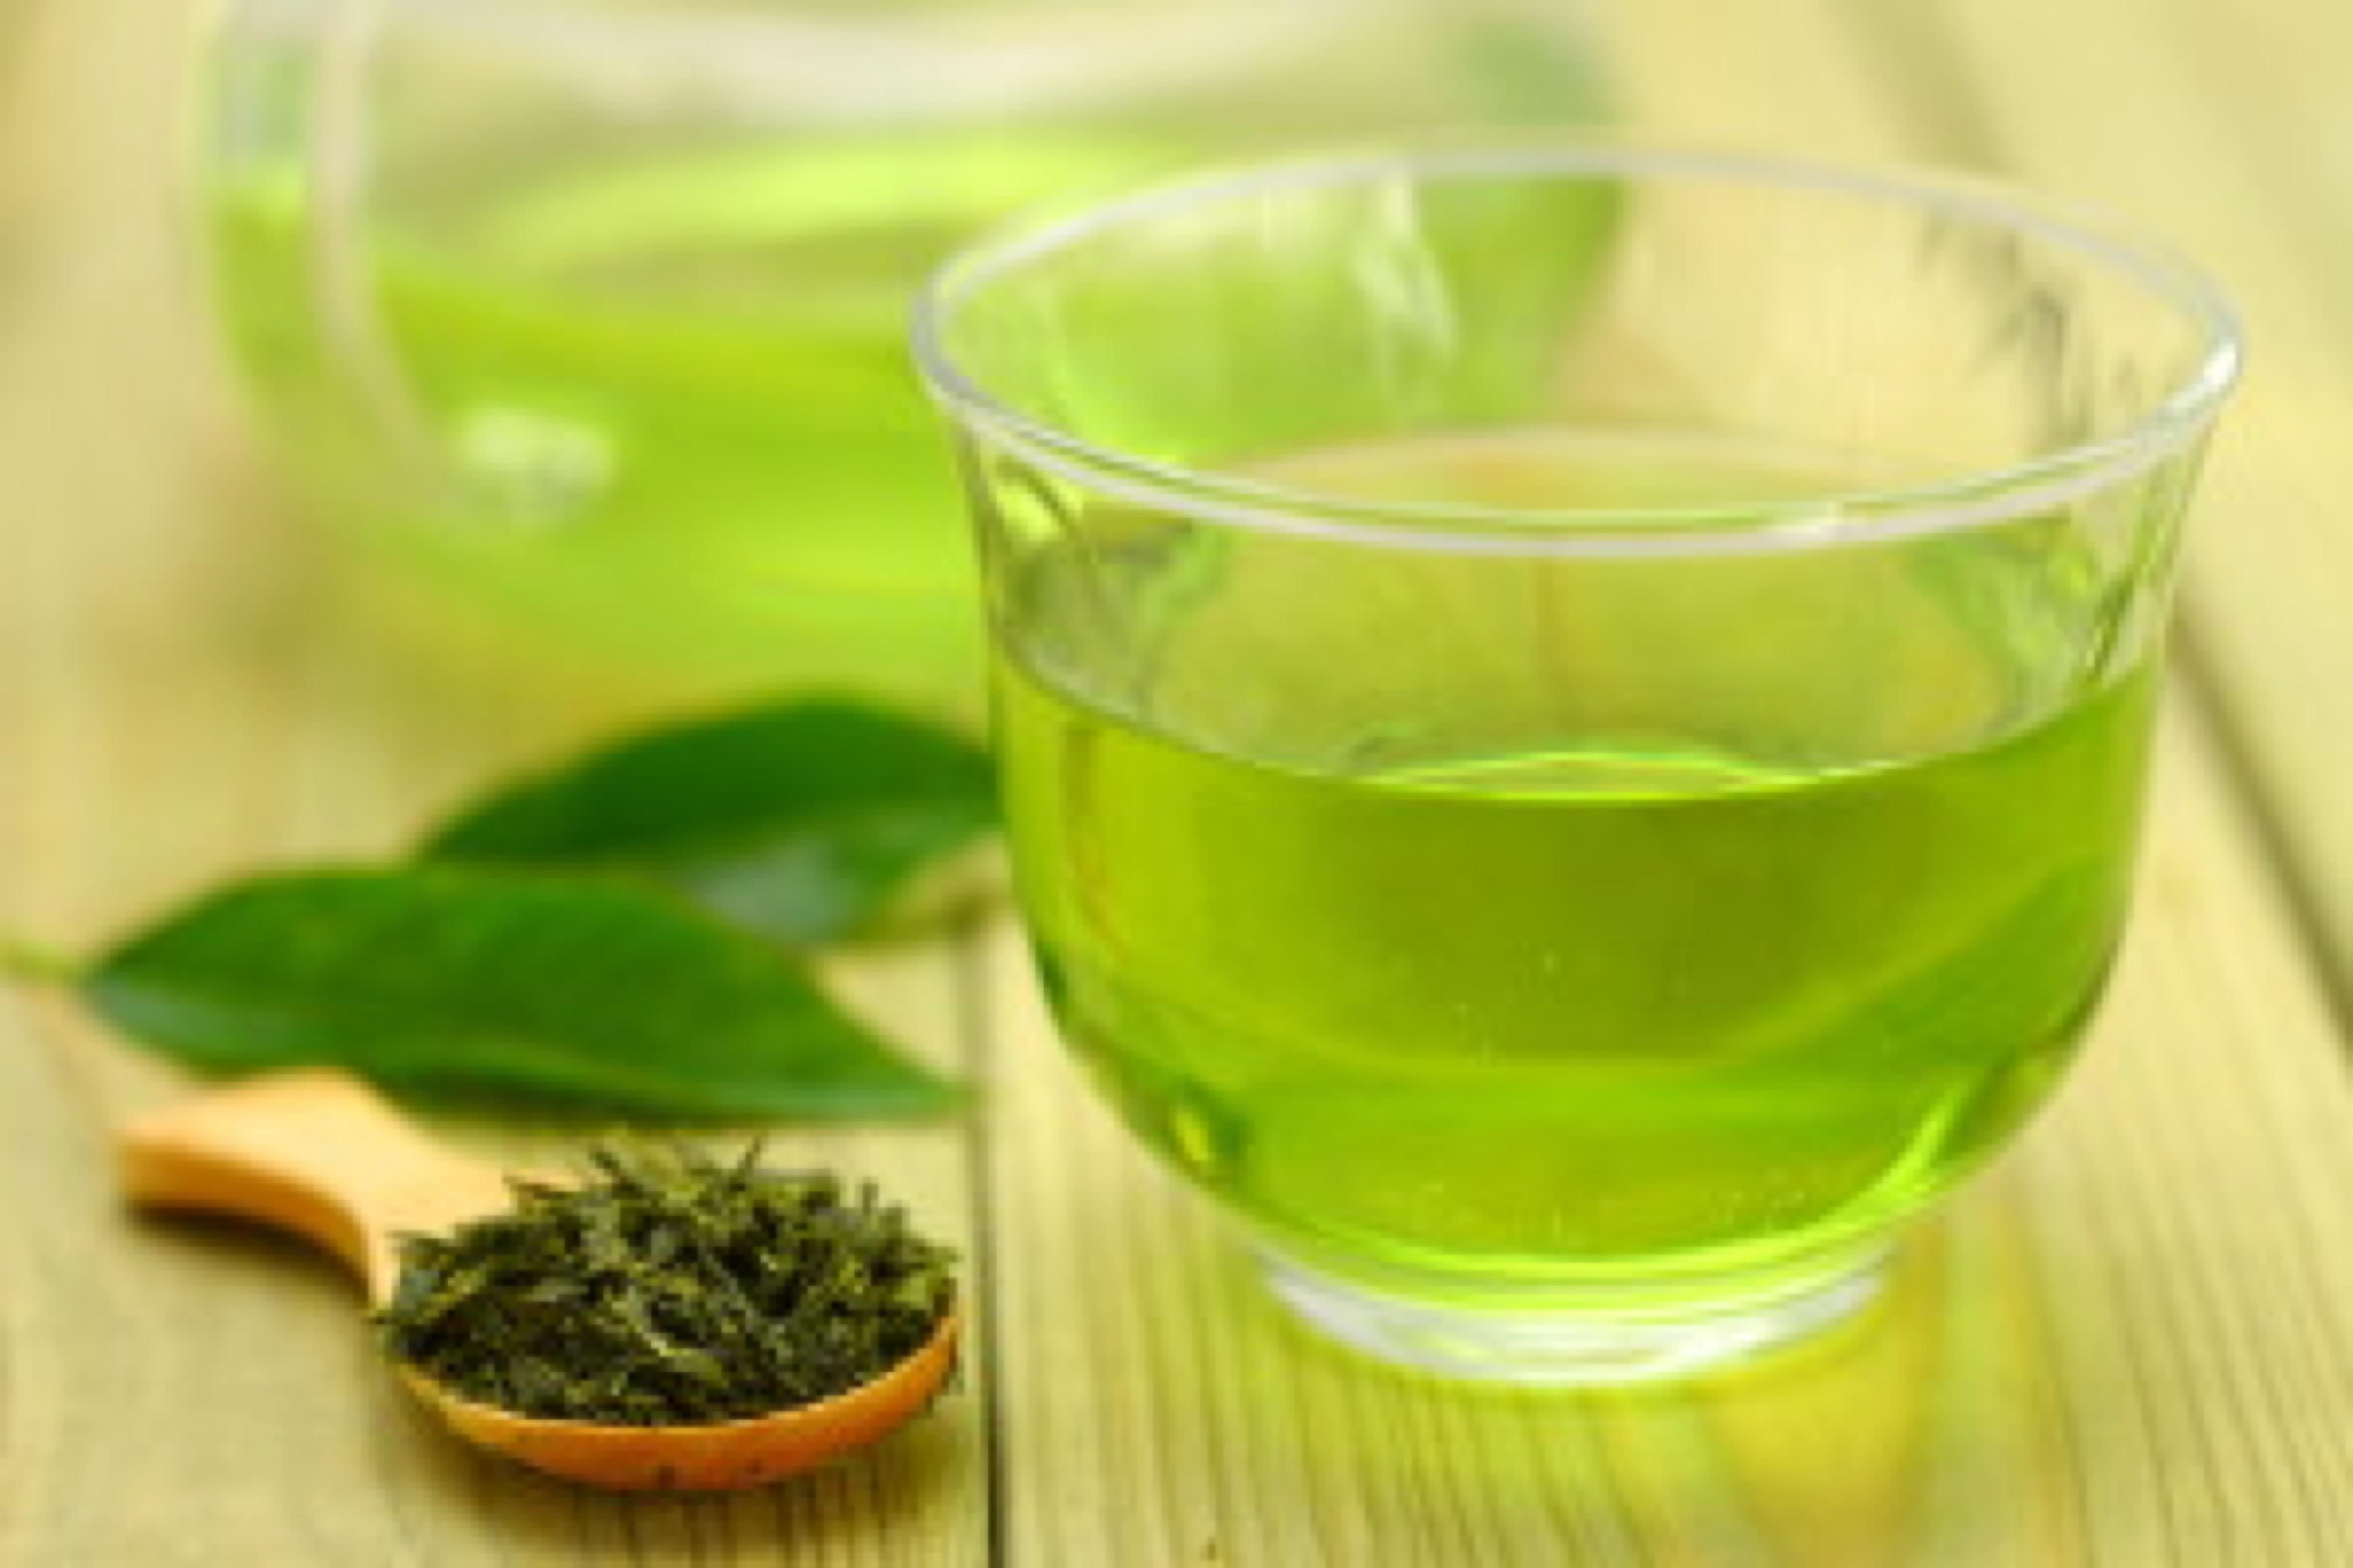 blog image - green tea (dollar paid)